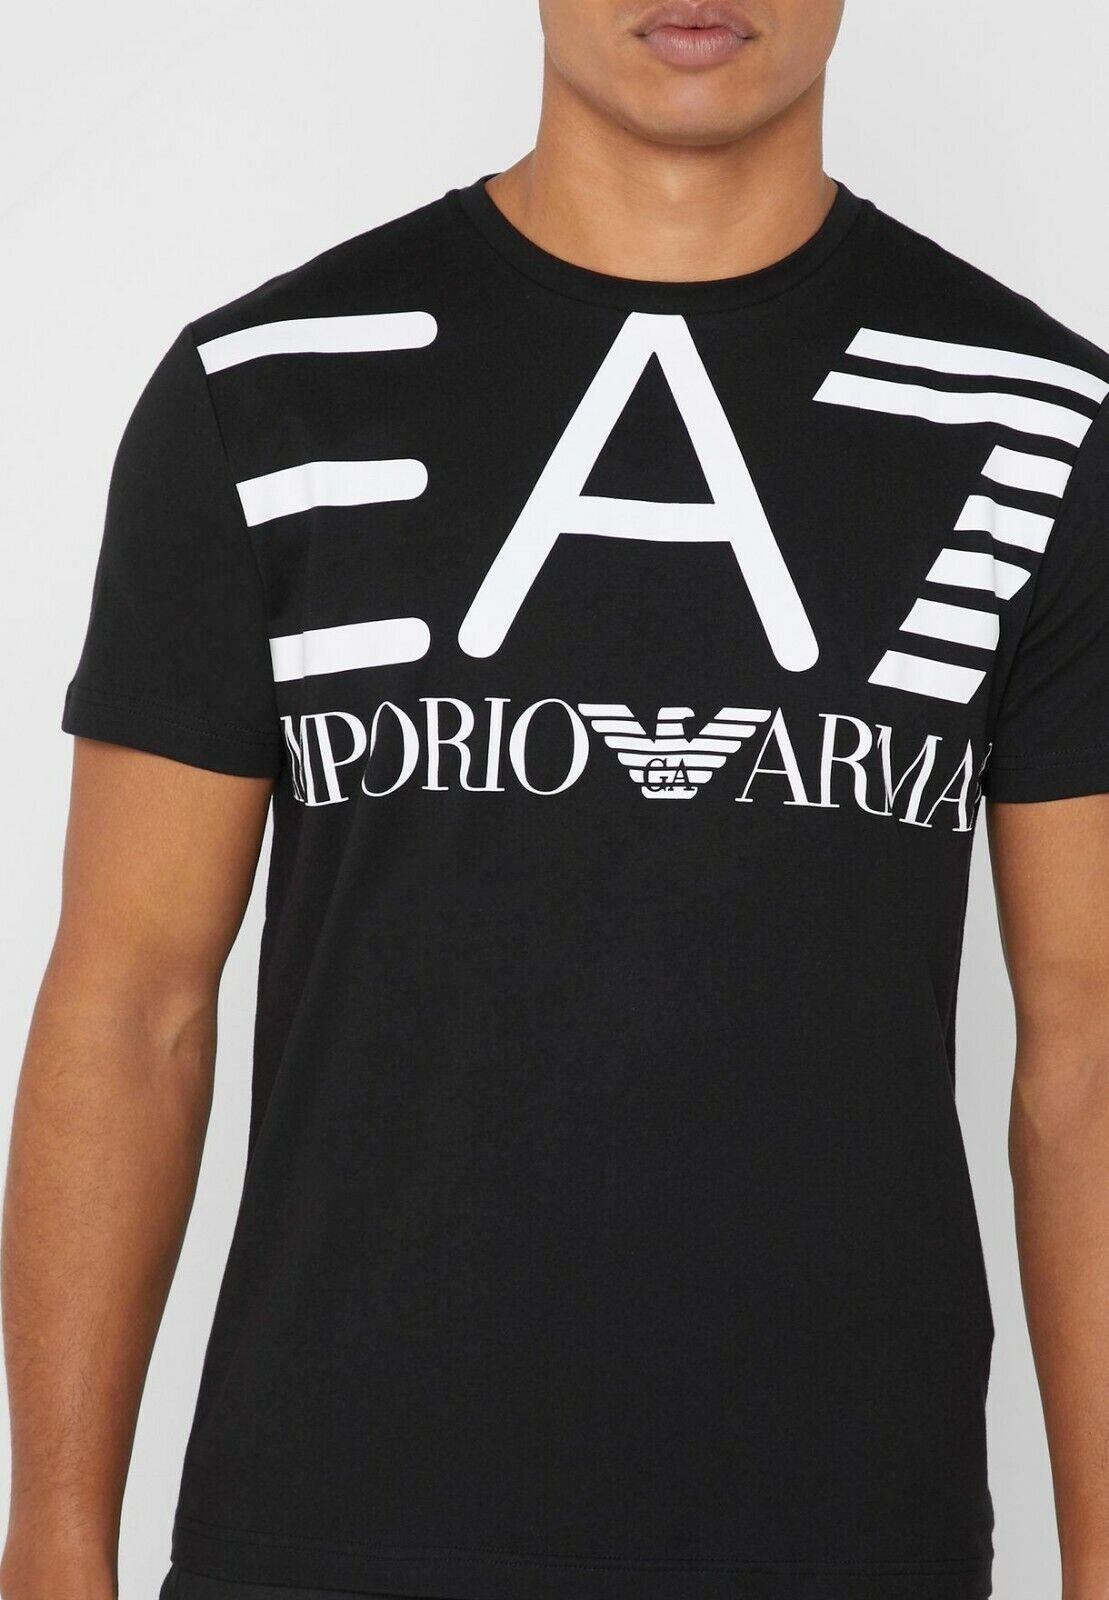 EA7 Camiseta de Hombre Cuello rojoondo Emporium  Armani Art. 3GPT06-2 Colors  n ° 1 en línea